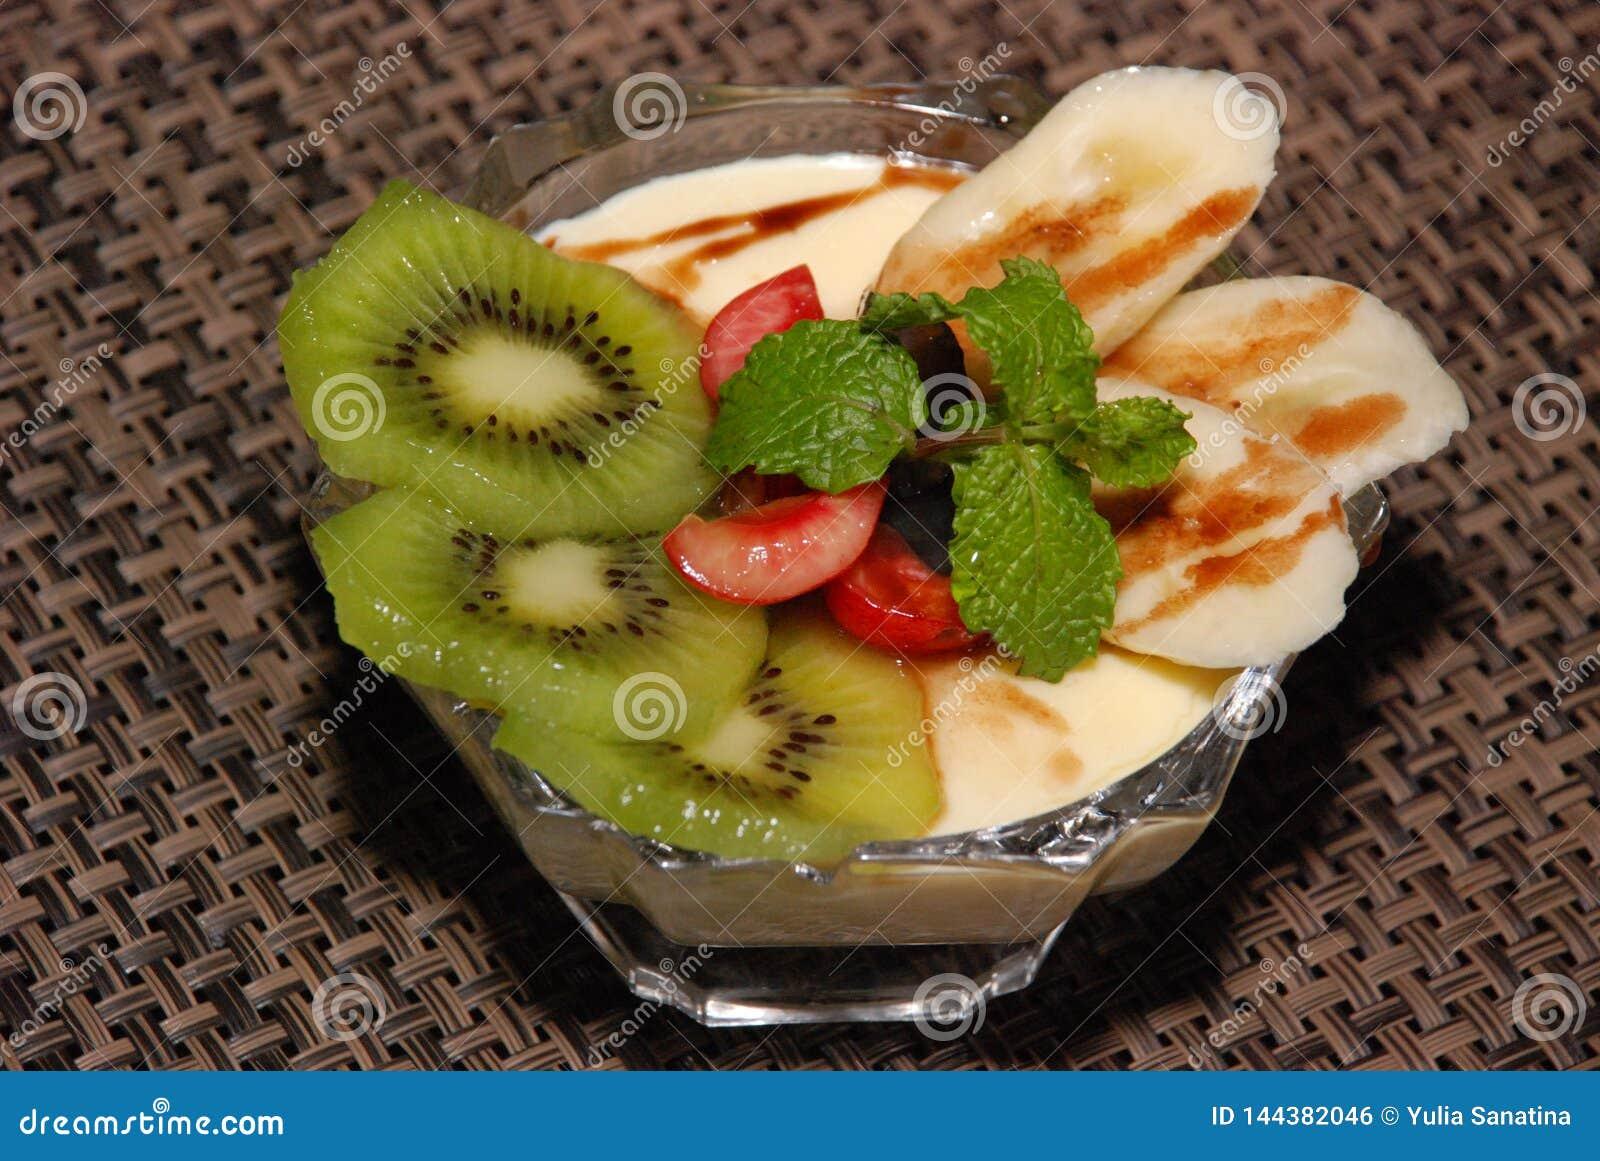 Milky desert with kiwi, cherry, banana, mint and chocolate toping